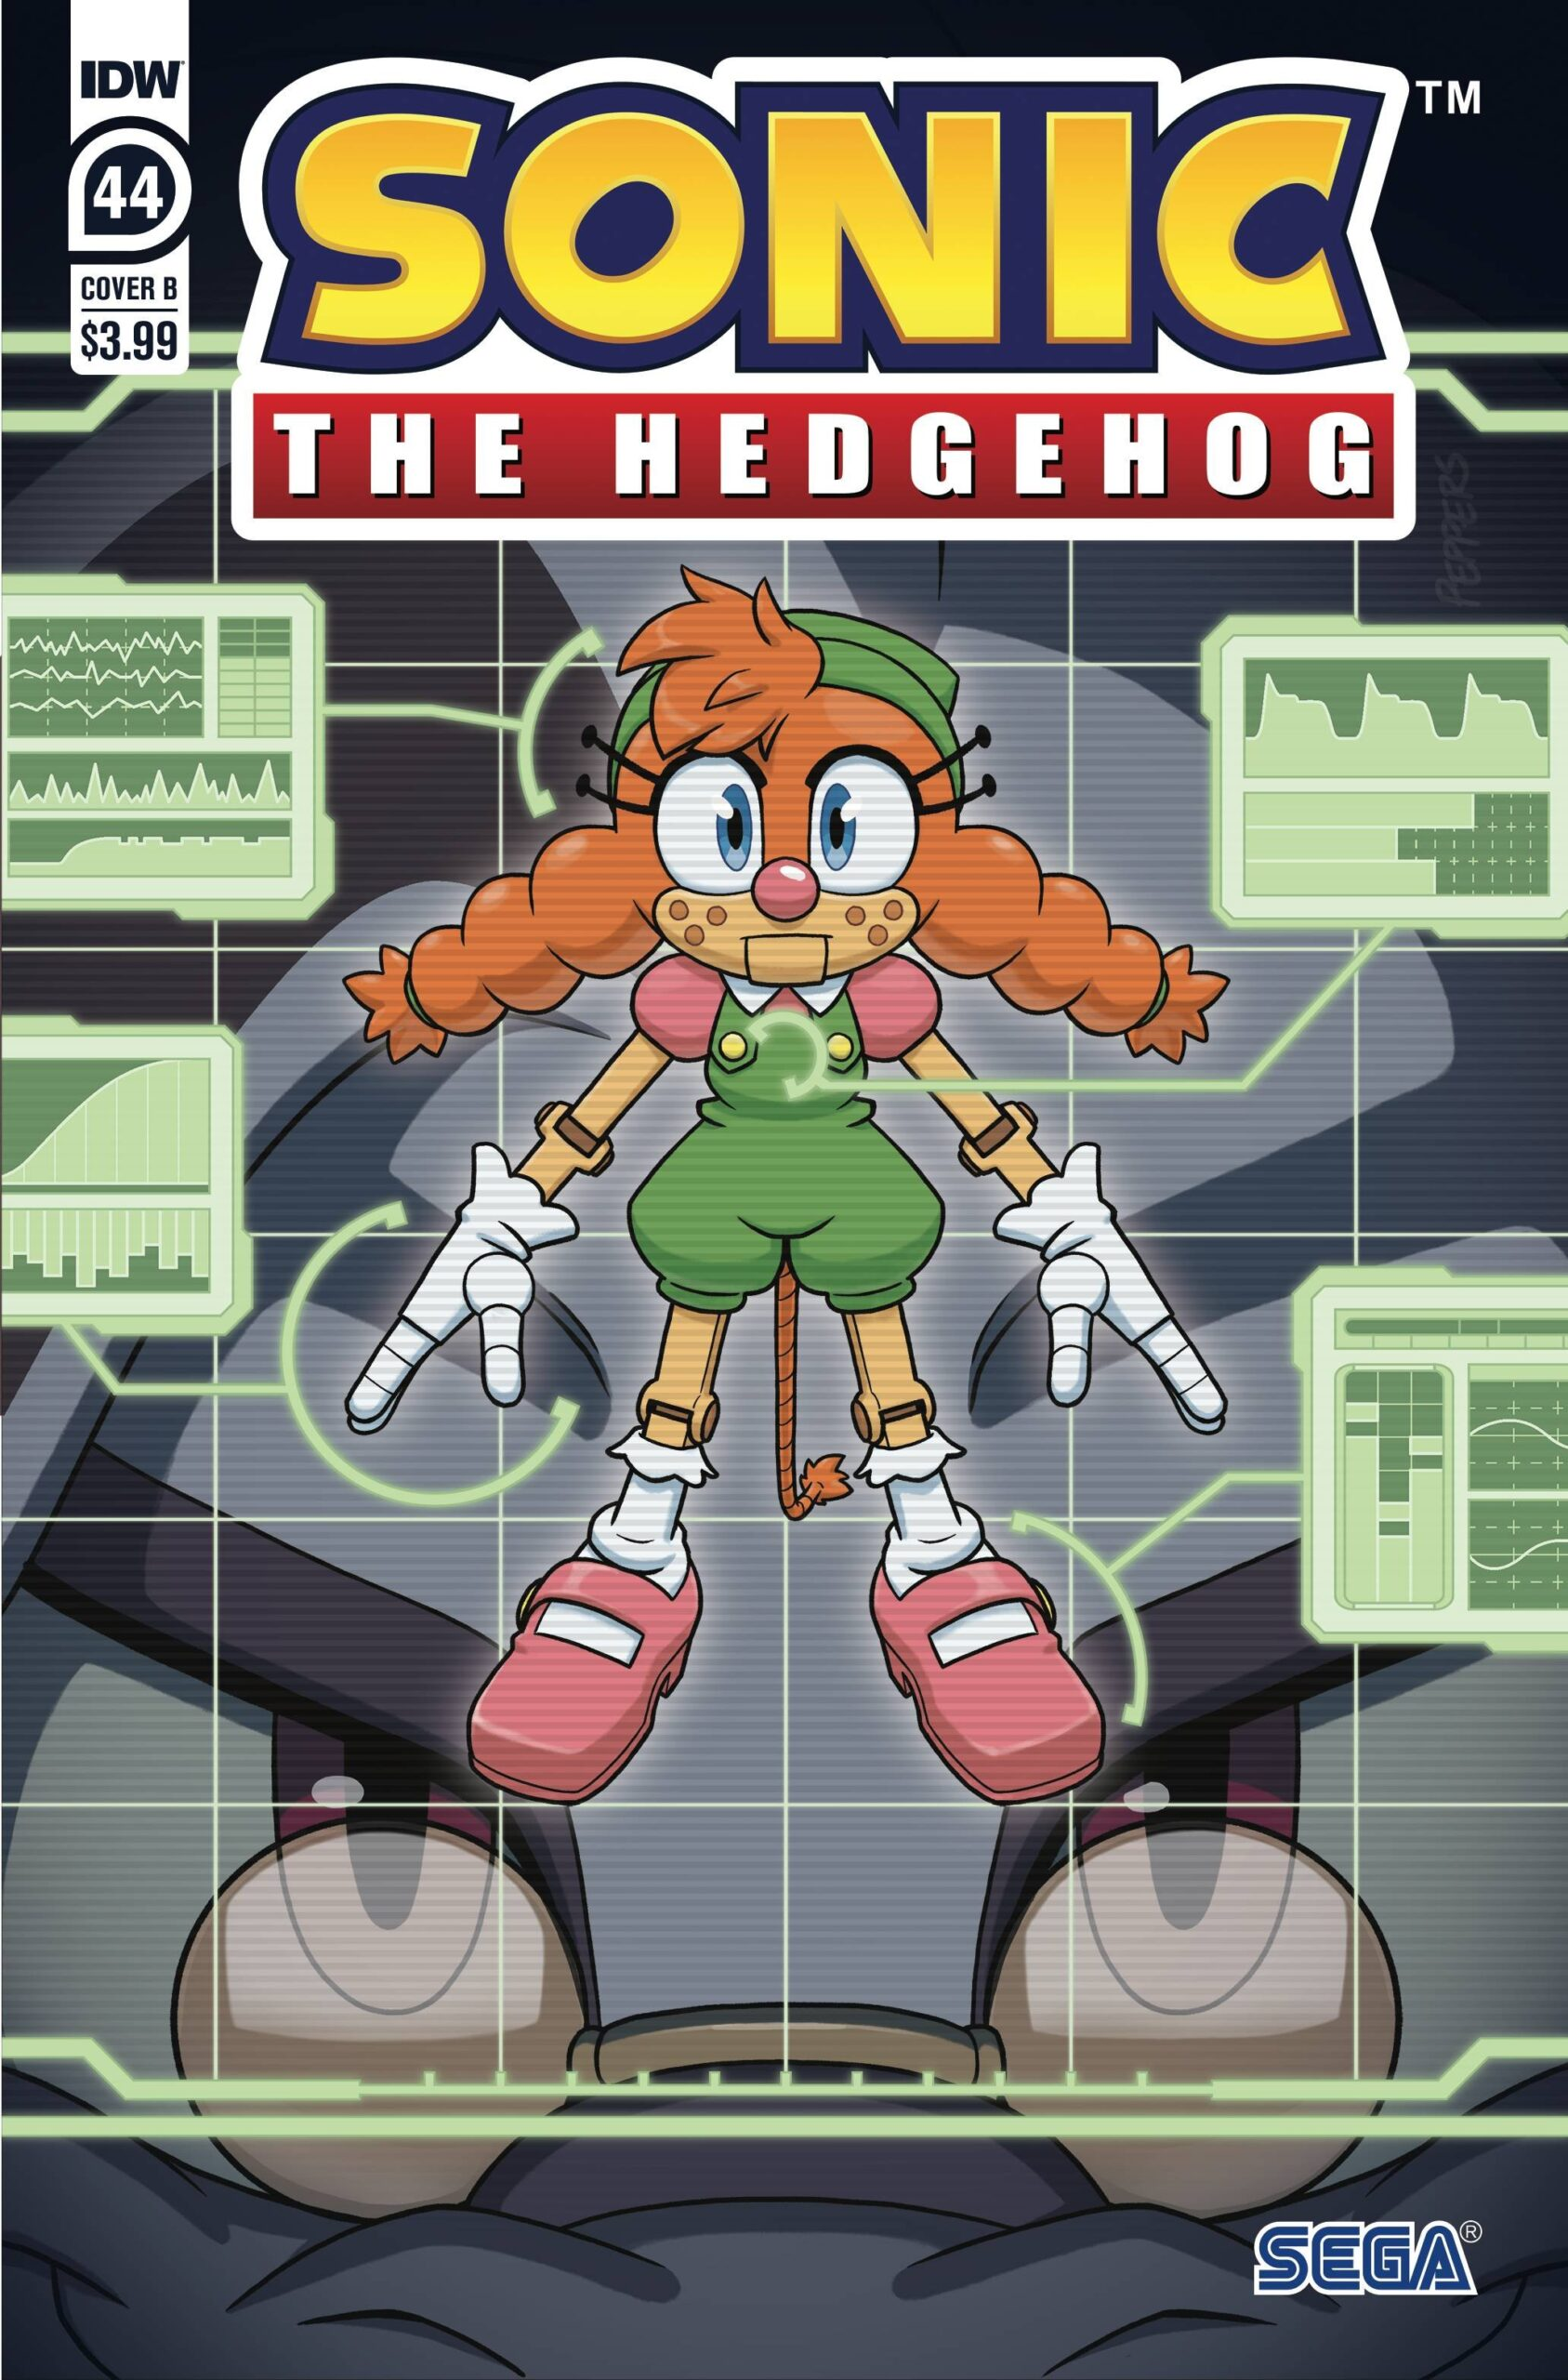 Sonic The Hedgehog #44 Cover B